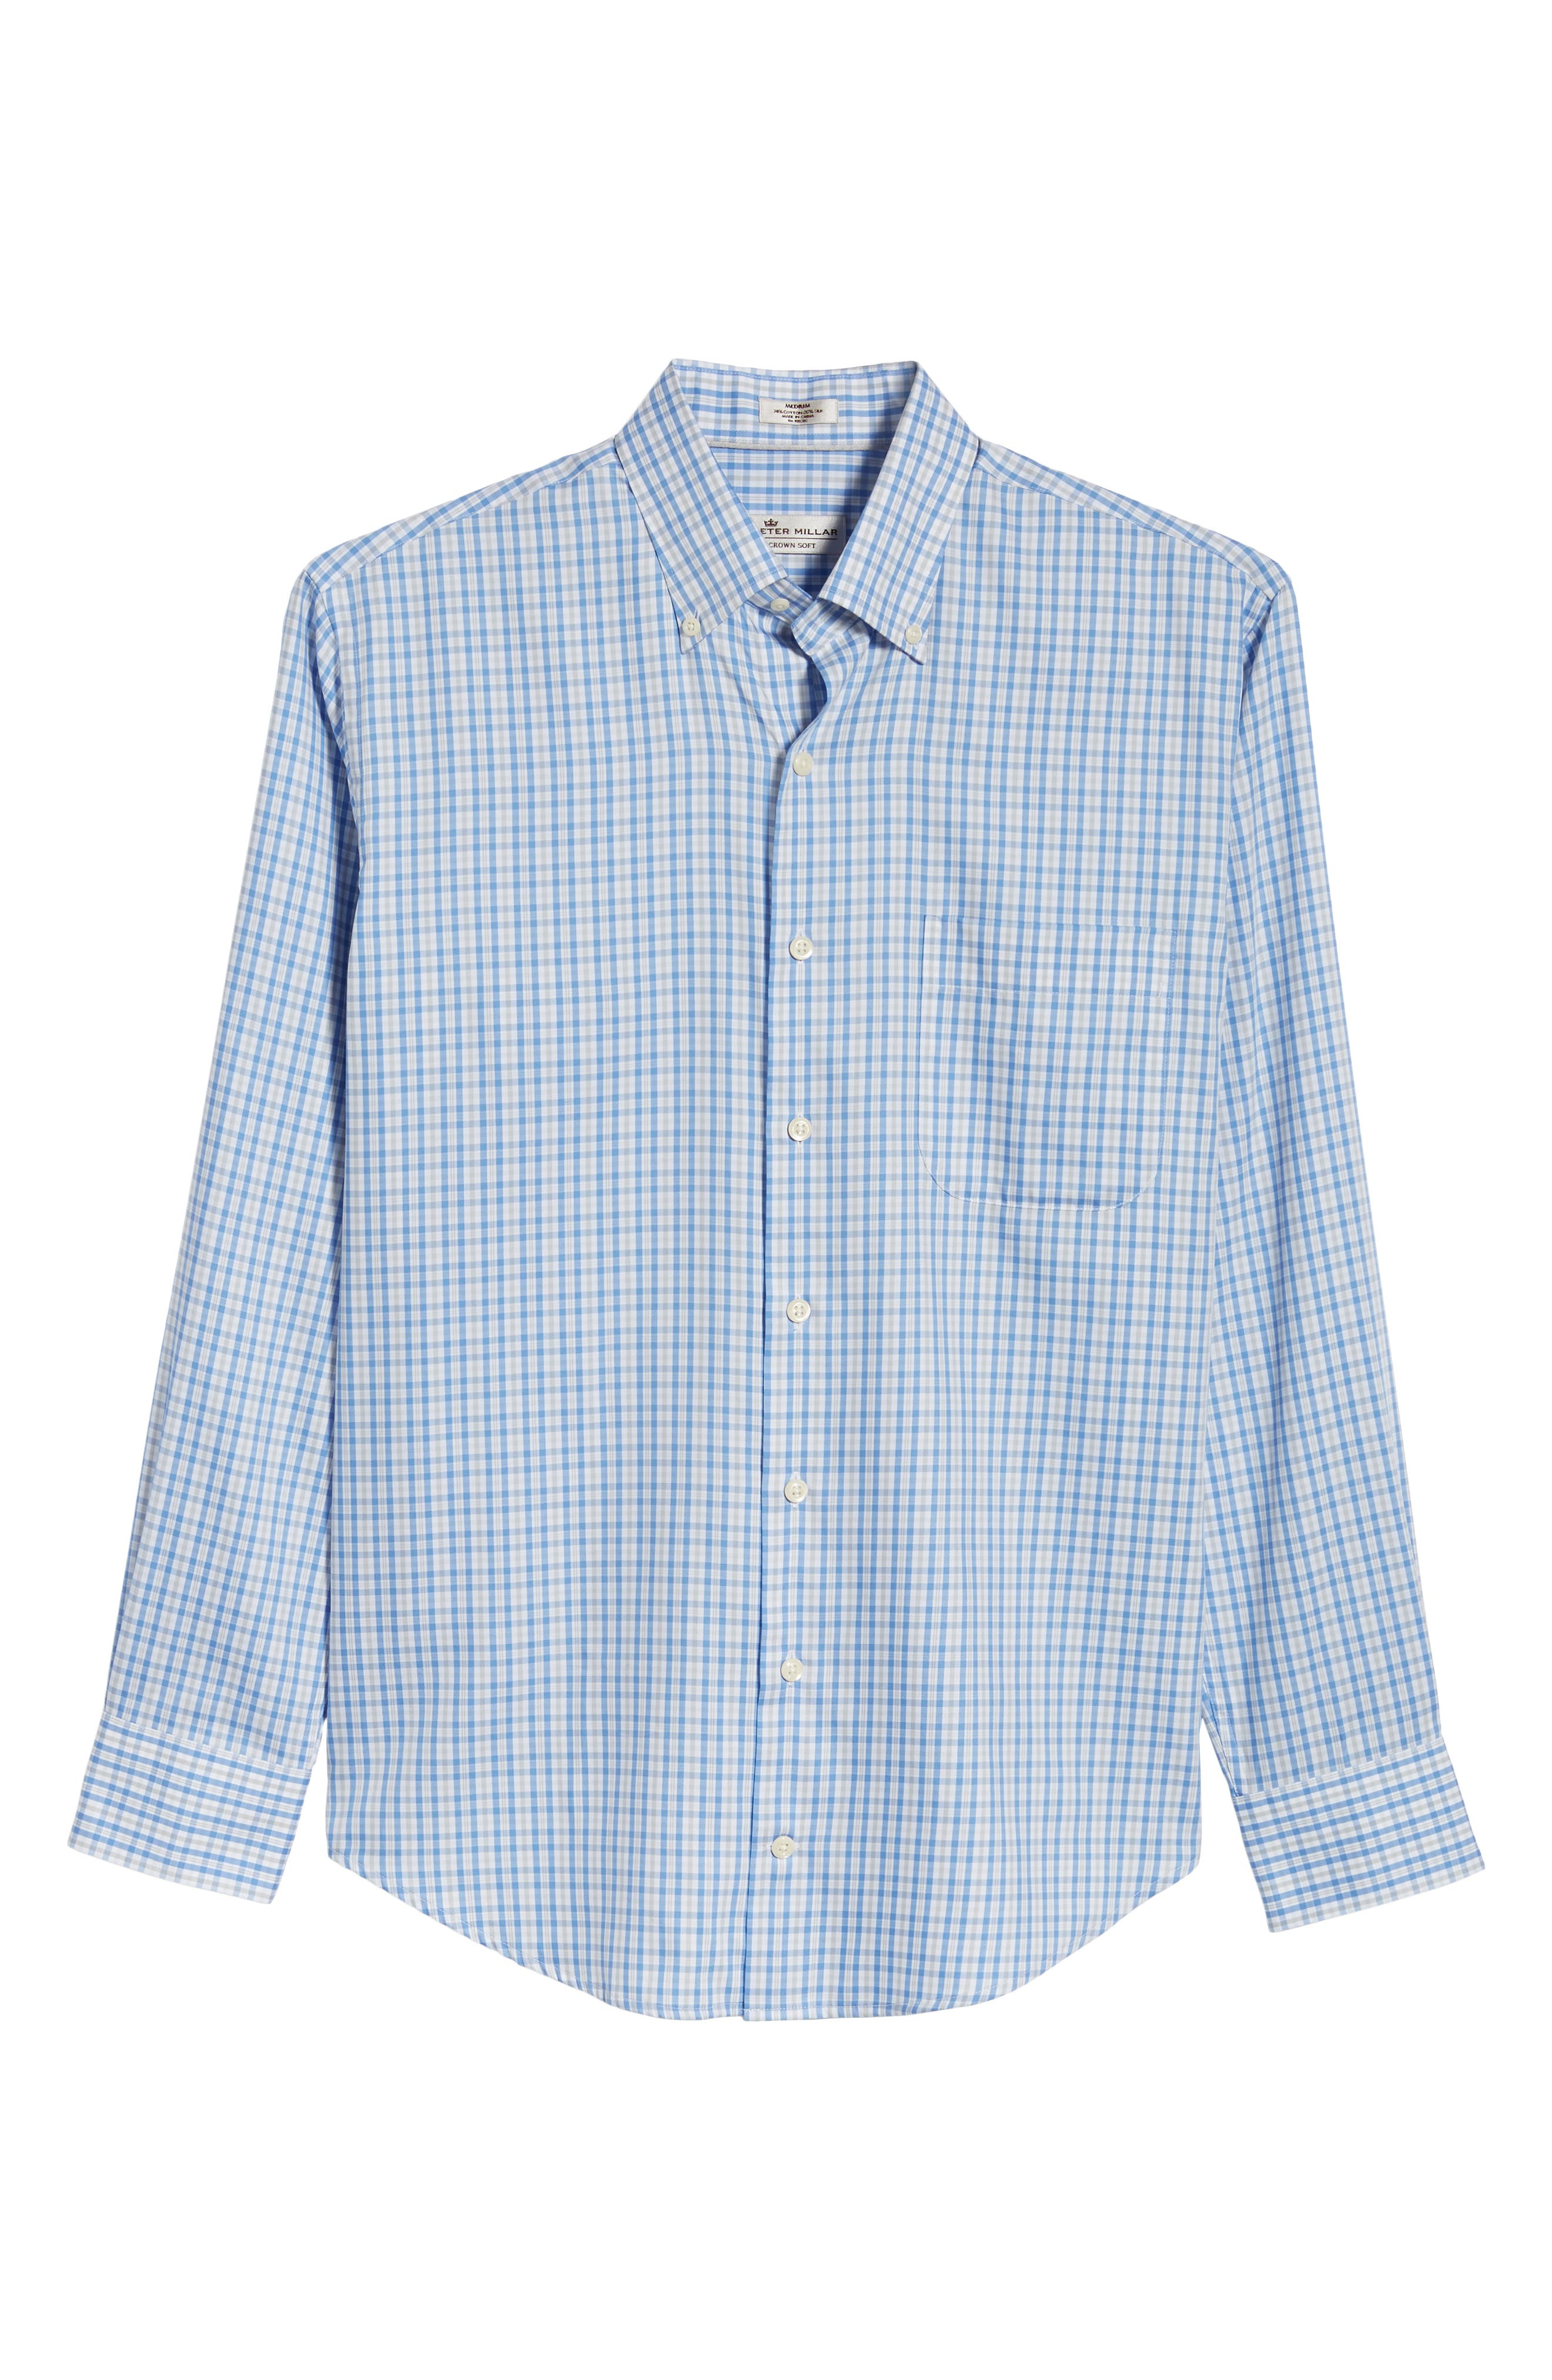 PETER MILLAR,                             Crown Soft First Hill Plaid Sport Shirt,                             Alternate thumbnail 6, color,                             485